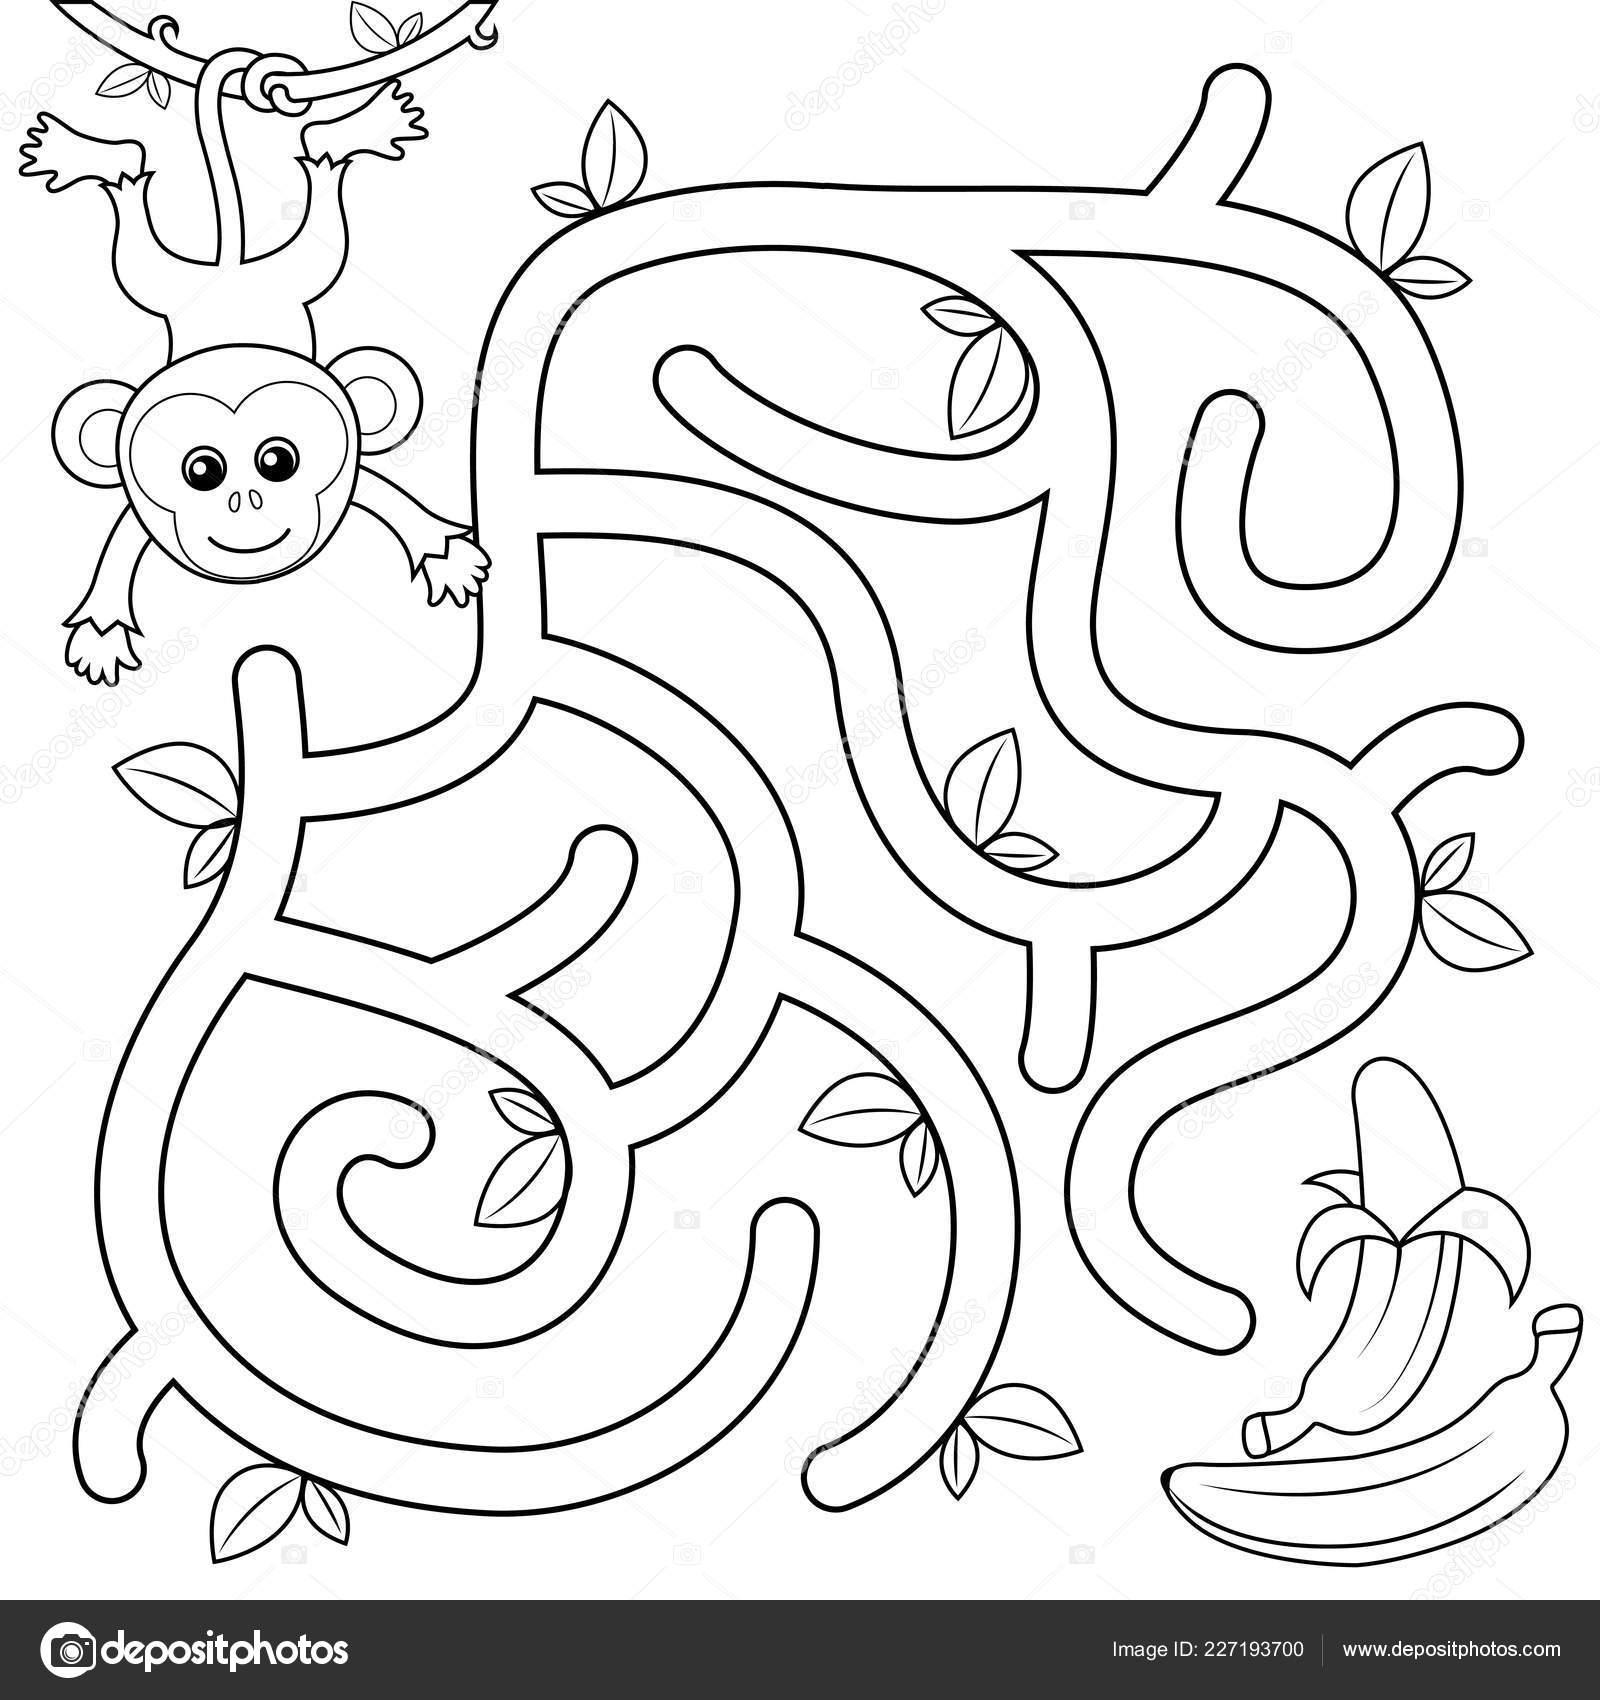 Help Monkey Find Path Banana Labyrinth Maze Game Kids